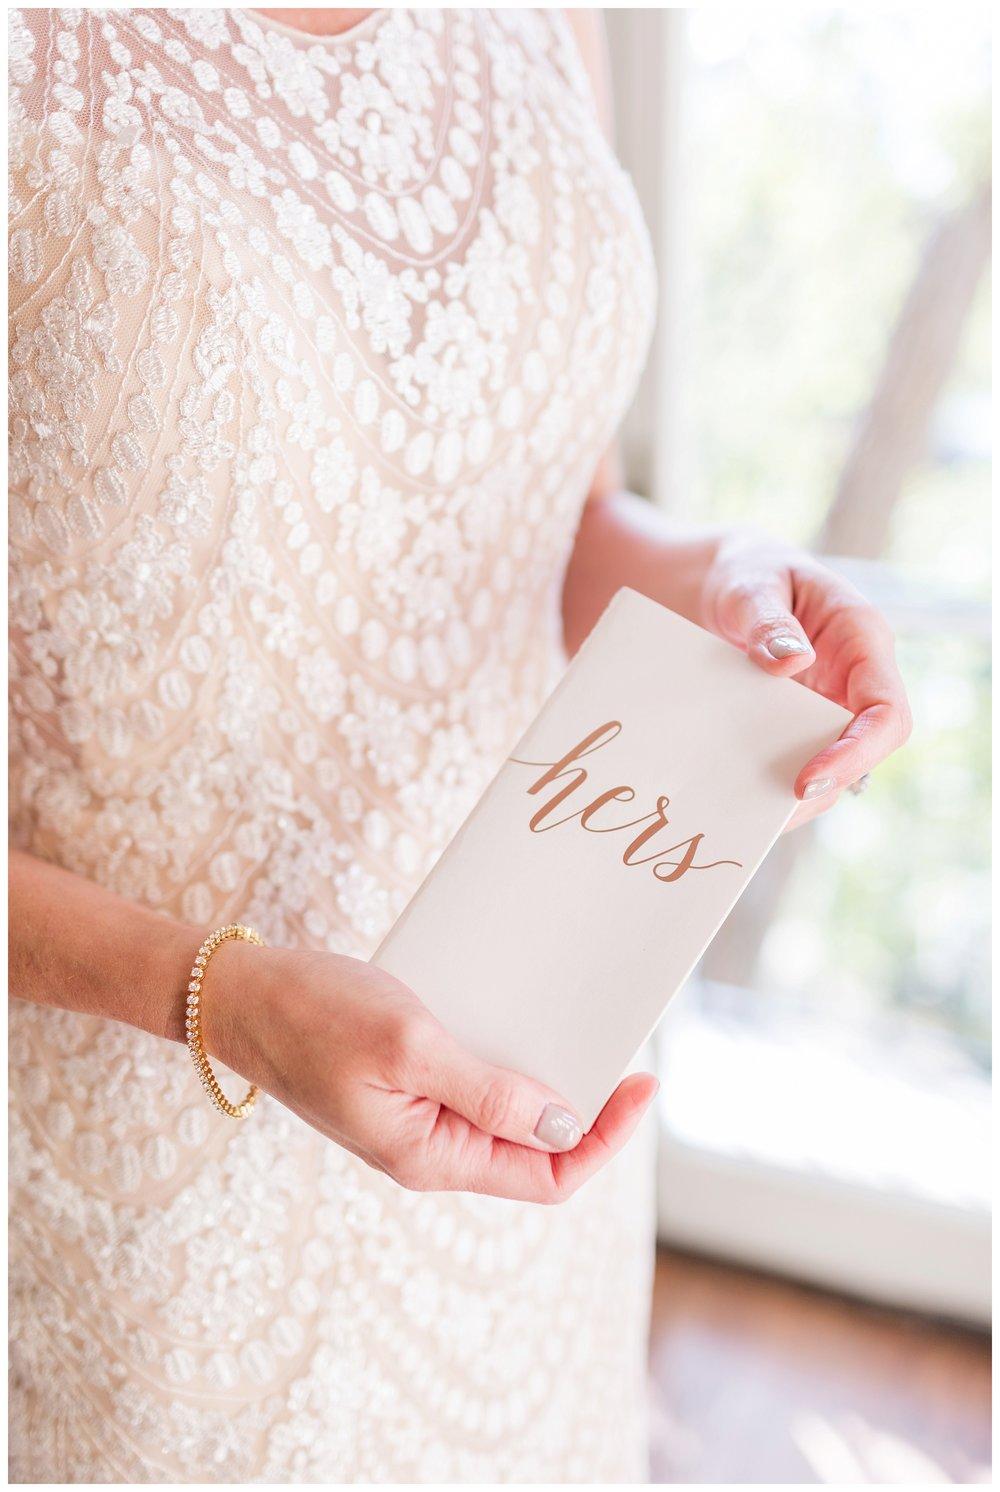 Meridian Hill Park Wedding | Washington DC Wedding Photographer Kir Tuben_0003.jpg